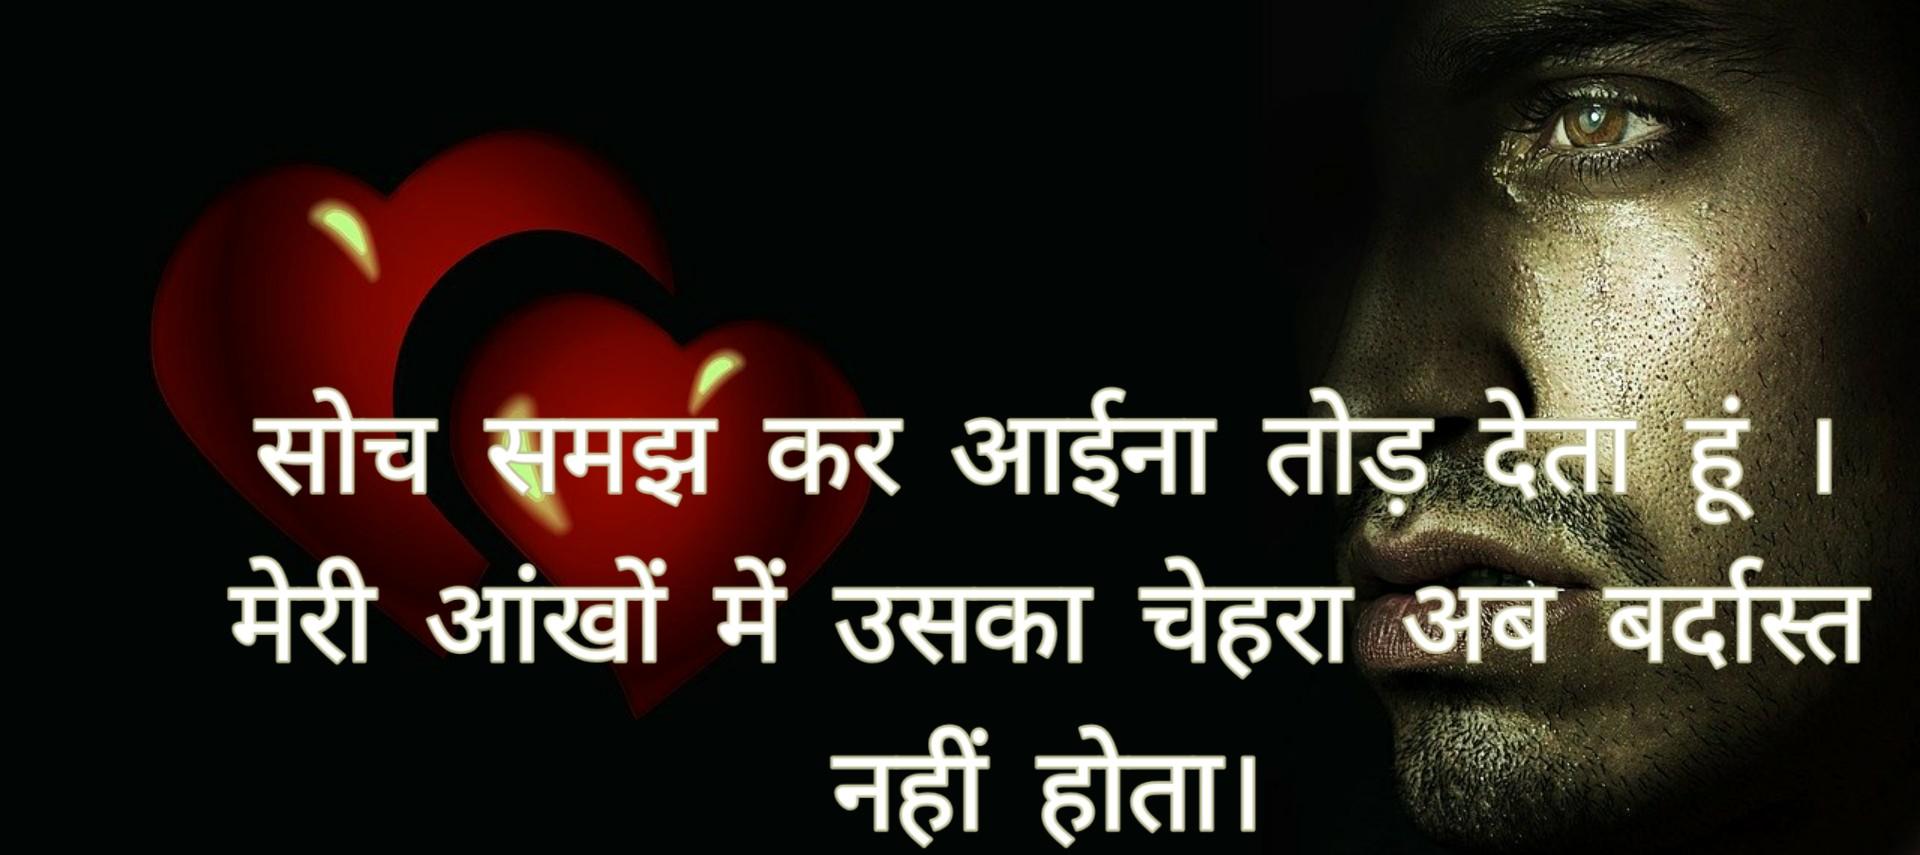 Aasu shayari for sadness